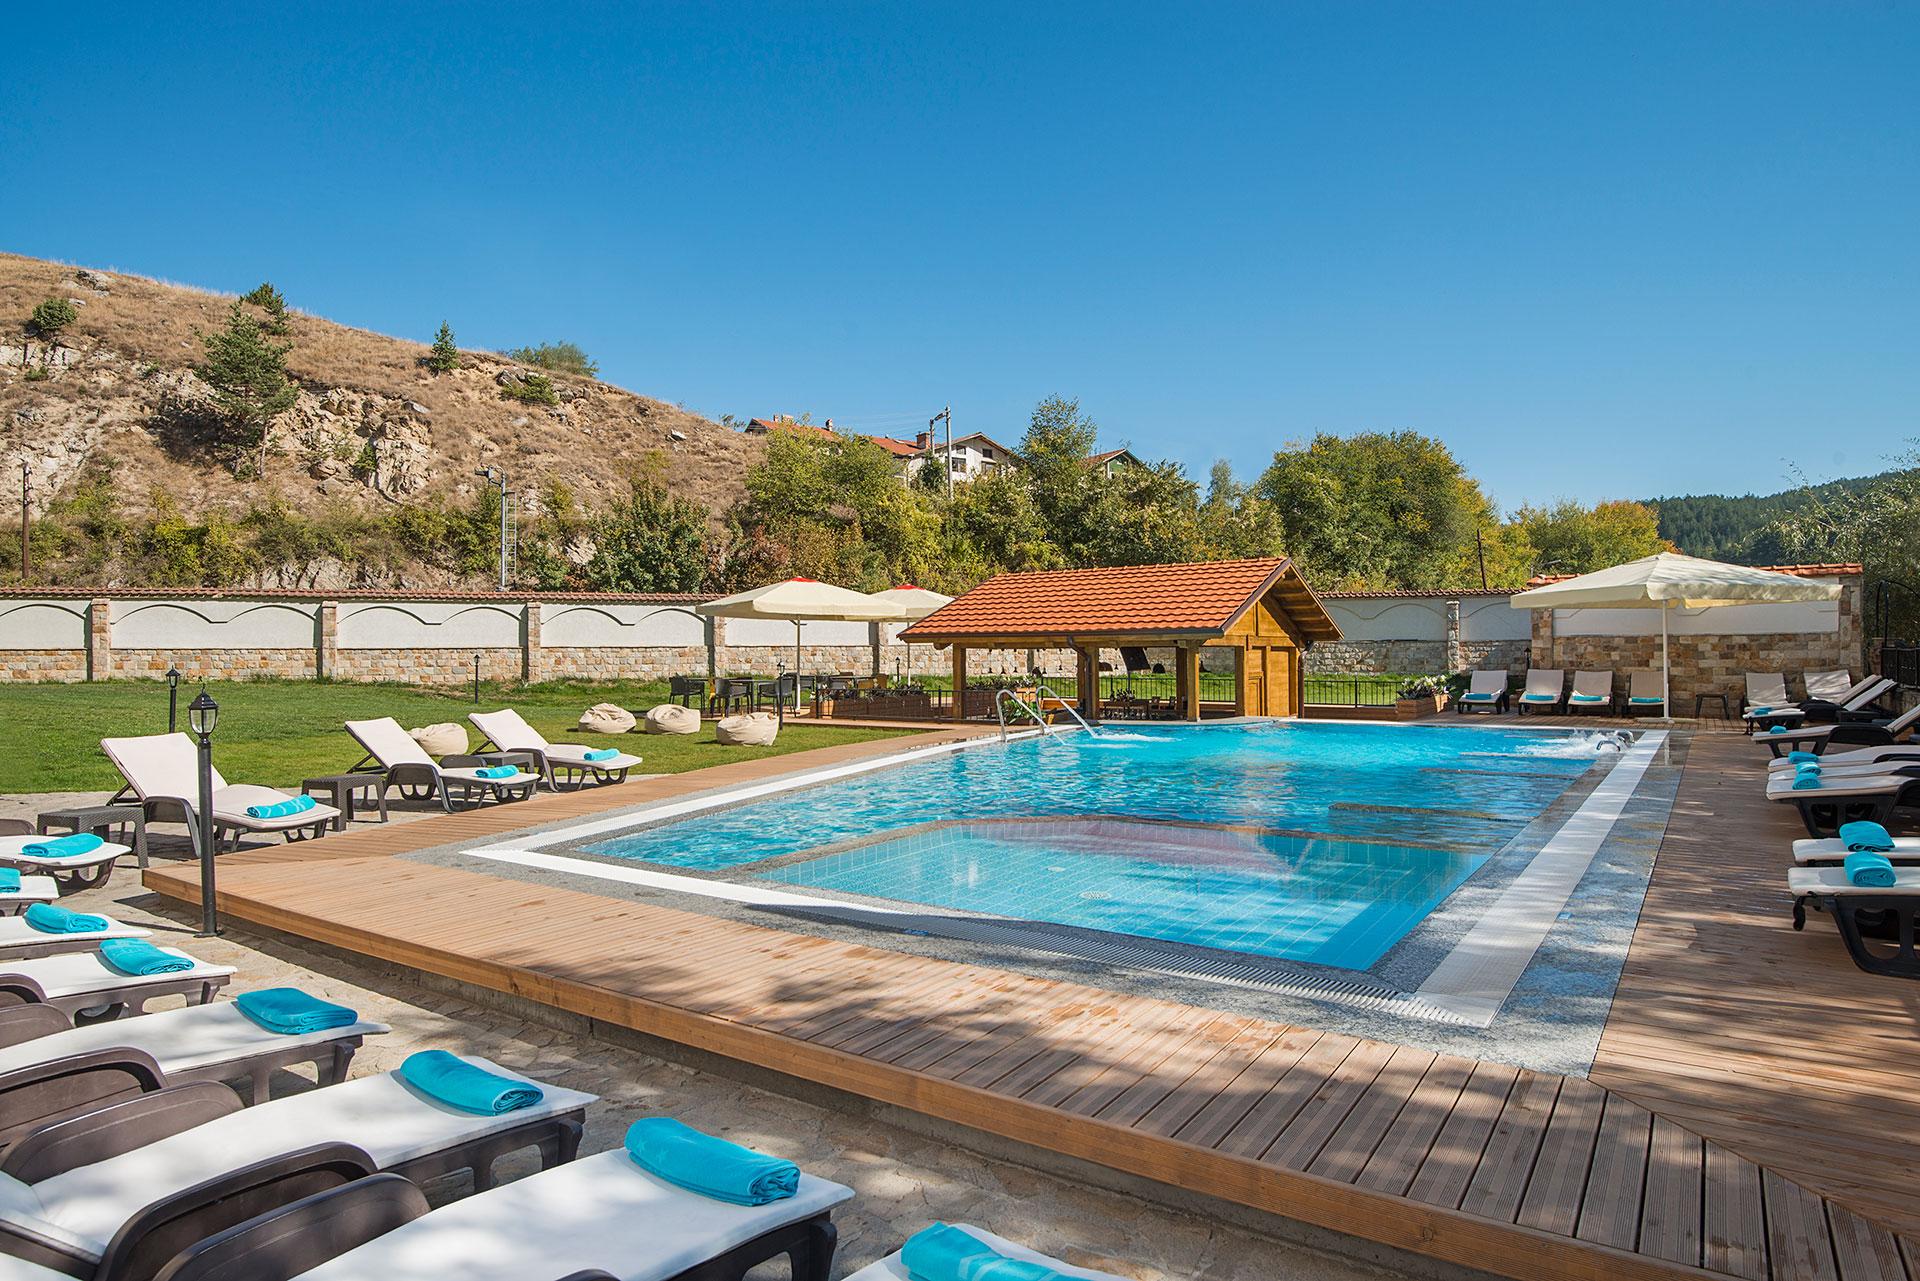 Aquatonic-outdoor-pool-with-a-built-in-bar-at-Balneo-Hotel-Saint-Spas-Velingrad